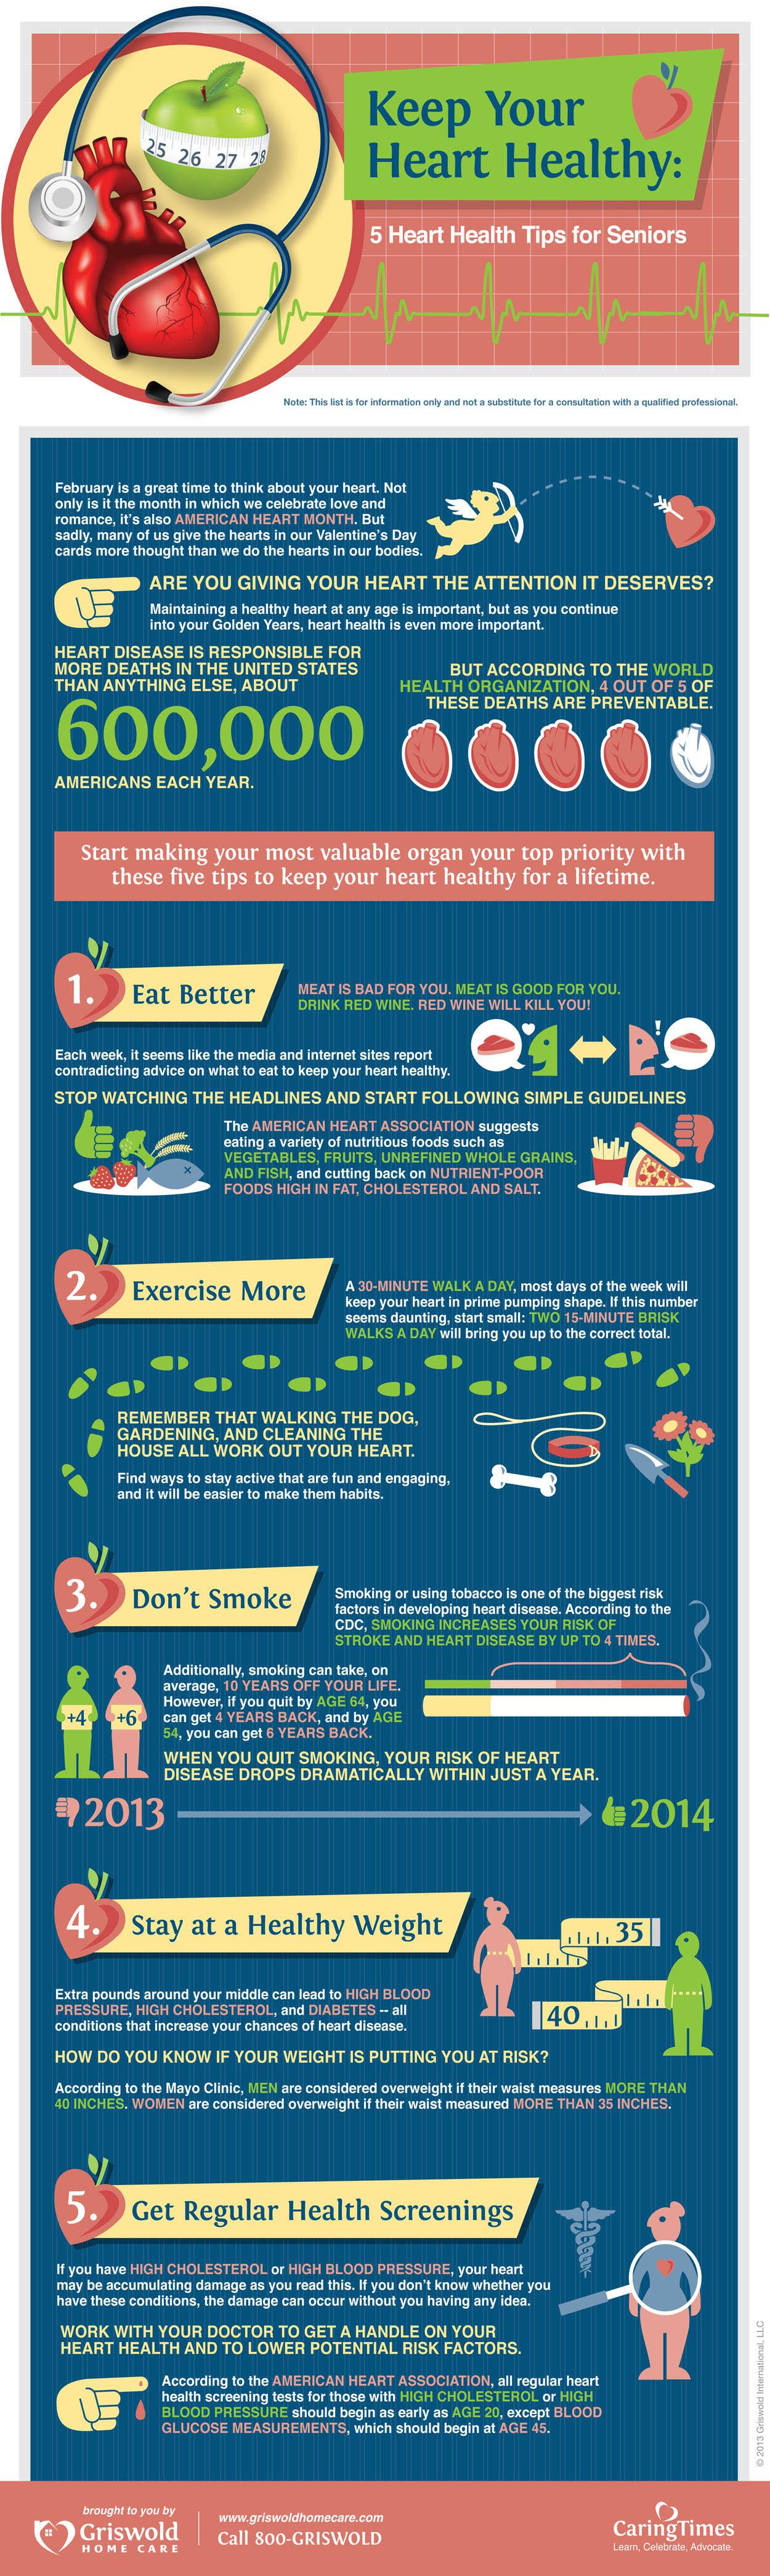 infographic five heart health tips for seniors